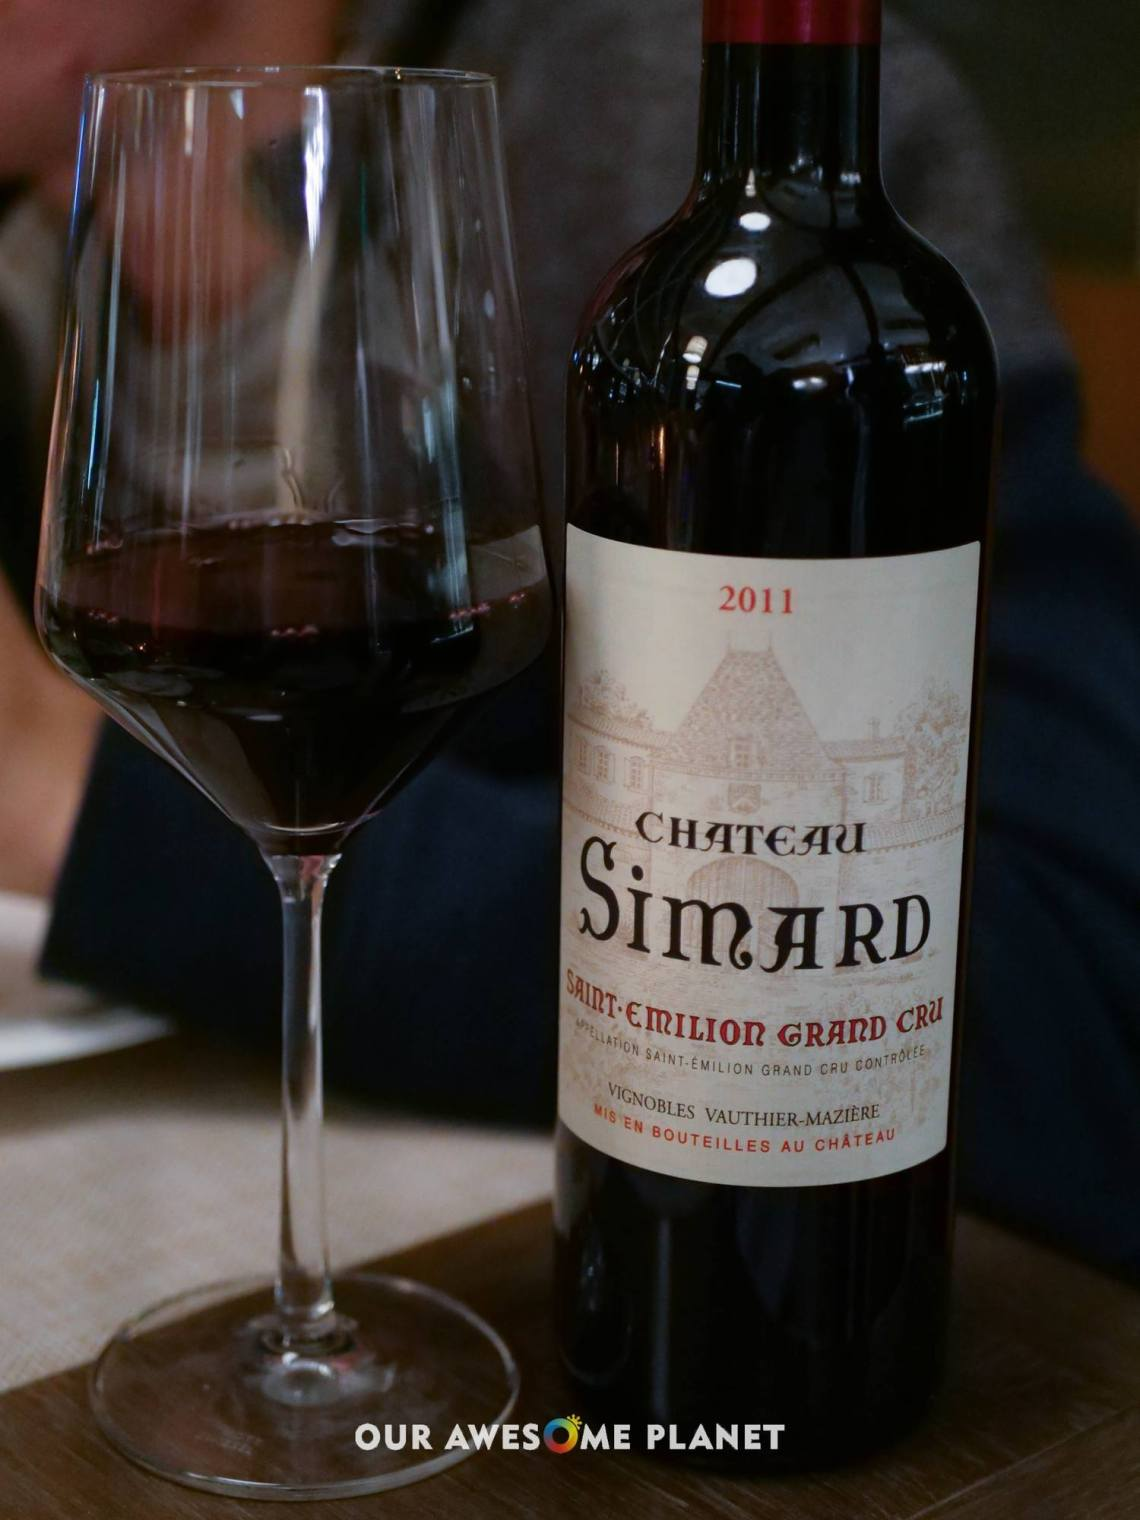 Chateau Simard Saint Emilion Grand Cru (Glass -₱900, Half-Bottle -₱1,700, Bottle -₱4,000)